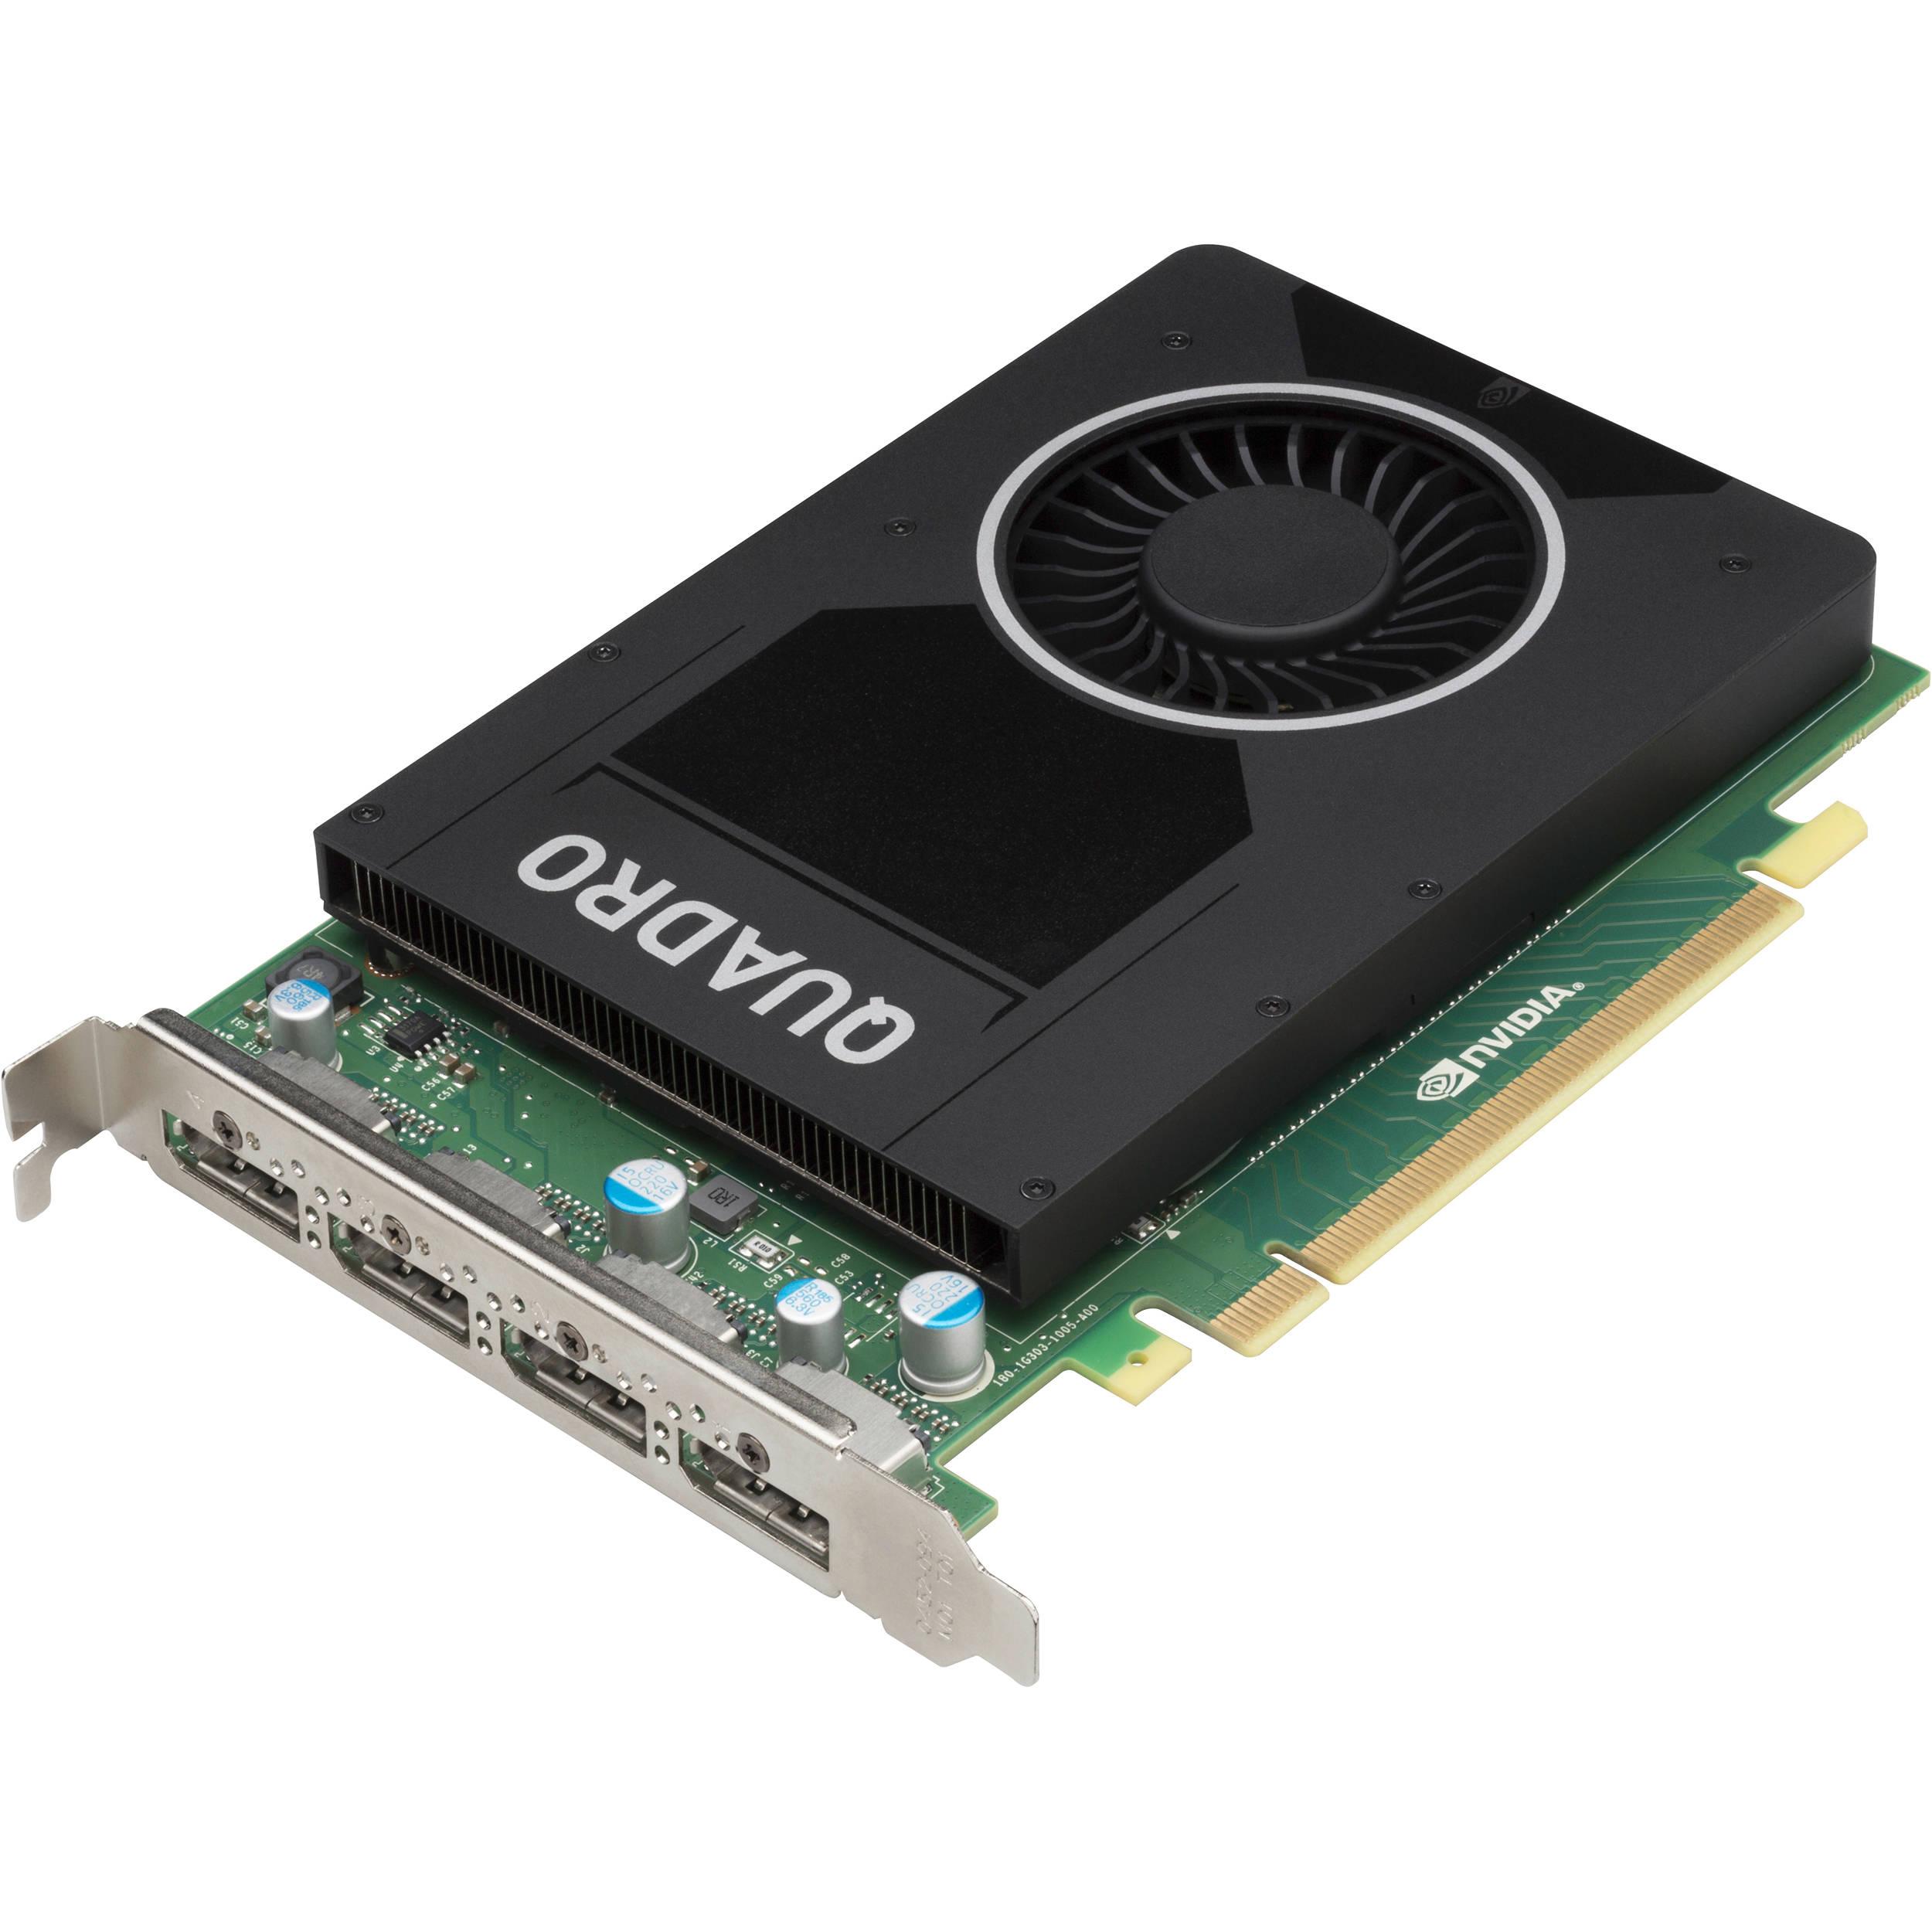 Nvidia nvs 4200m max resolution for vgalasopatask laptop